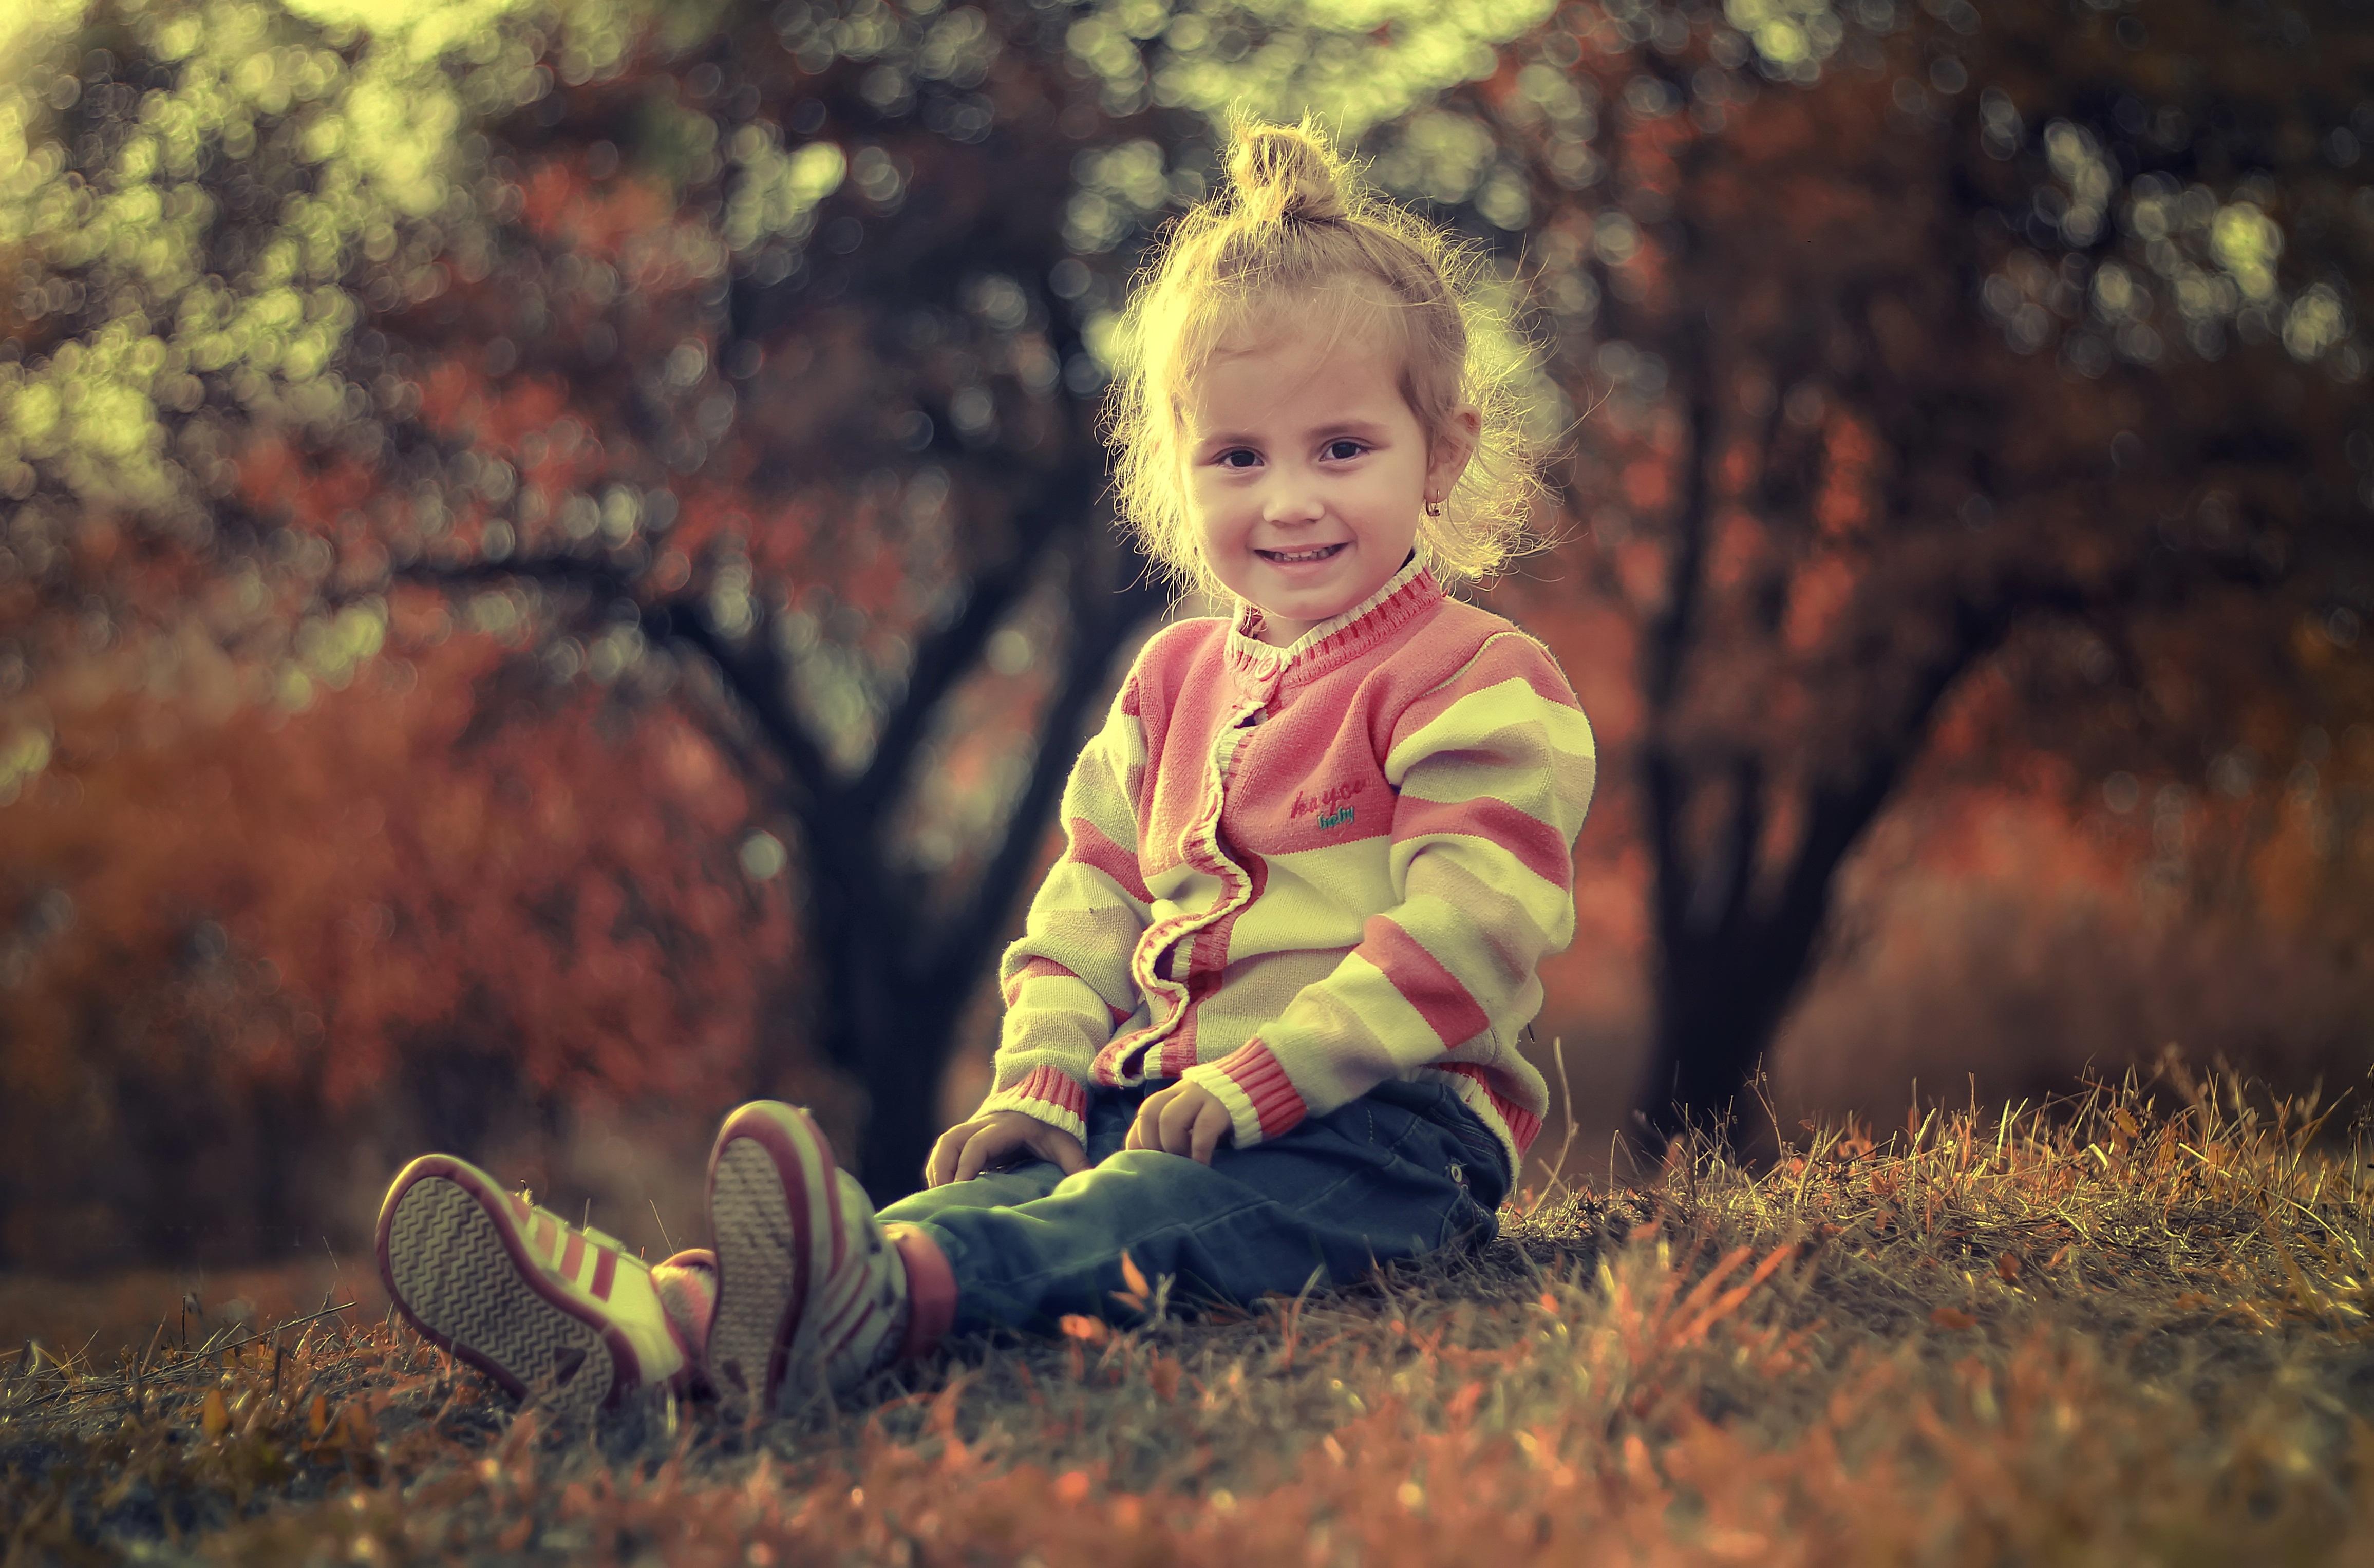 A plant that makes children happy 29